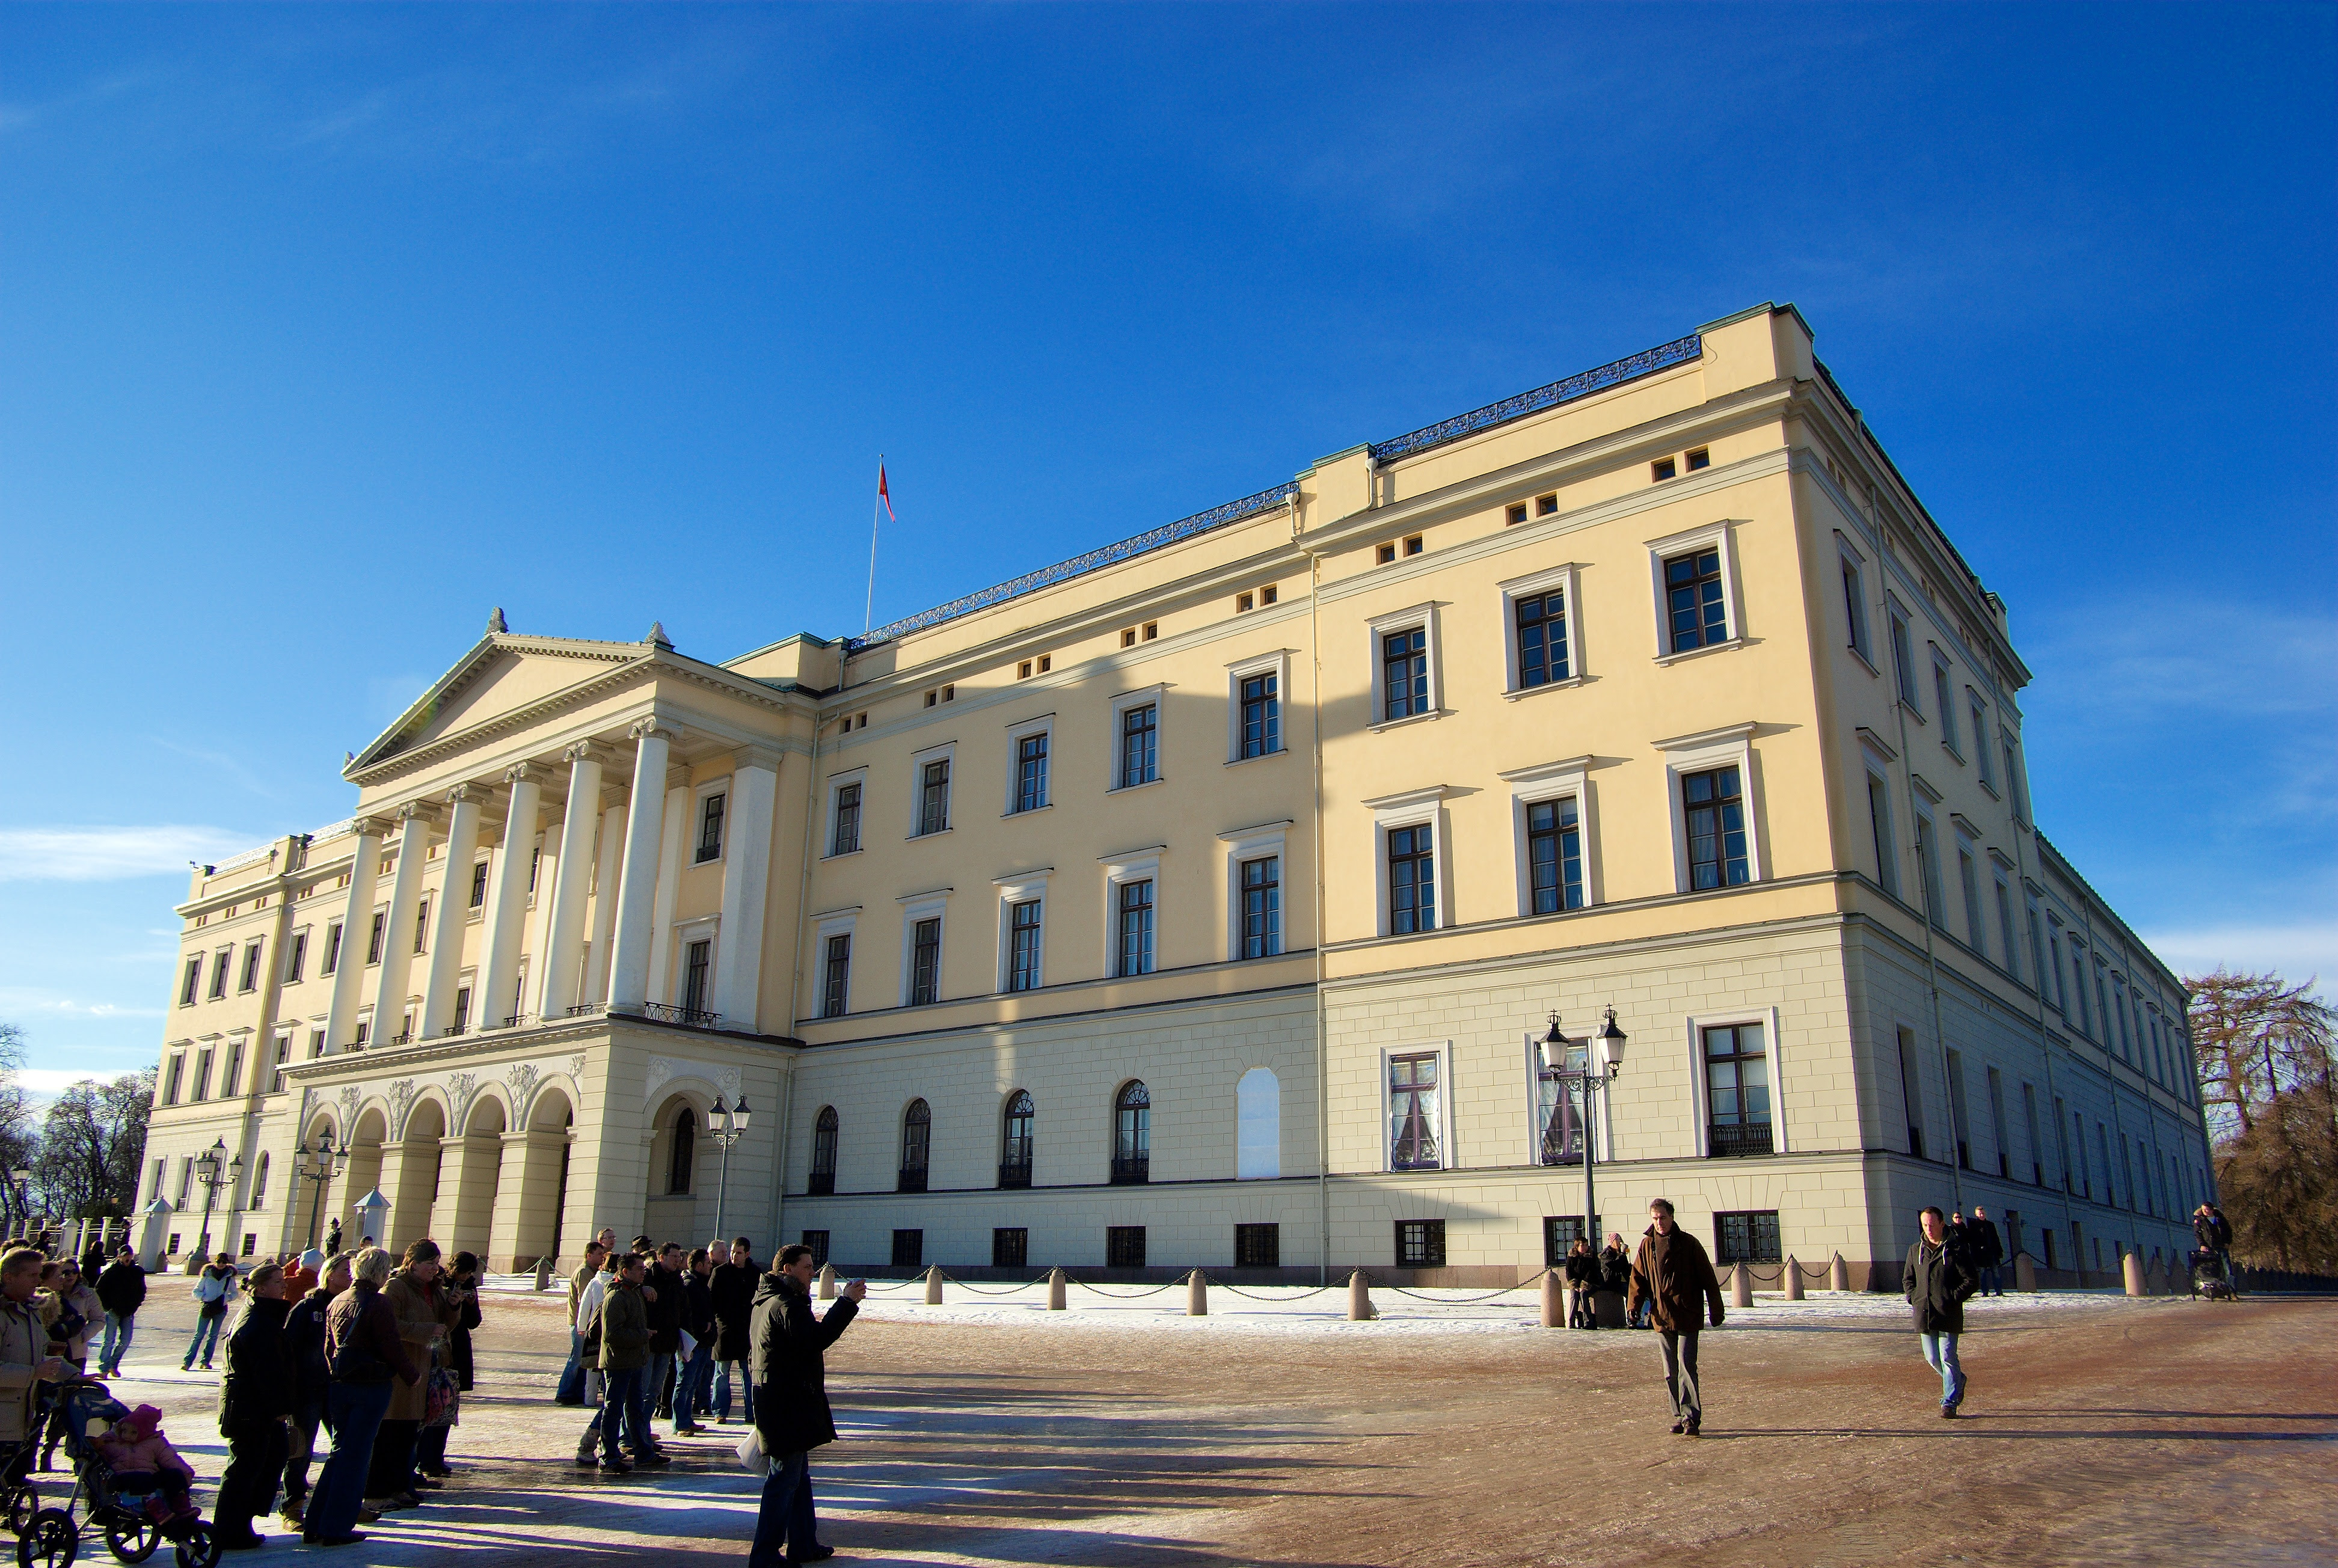 The Royal Palace of Oslo